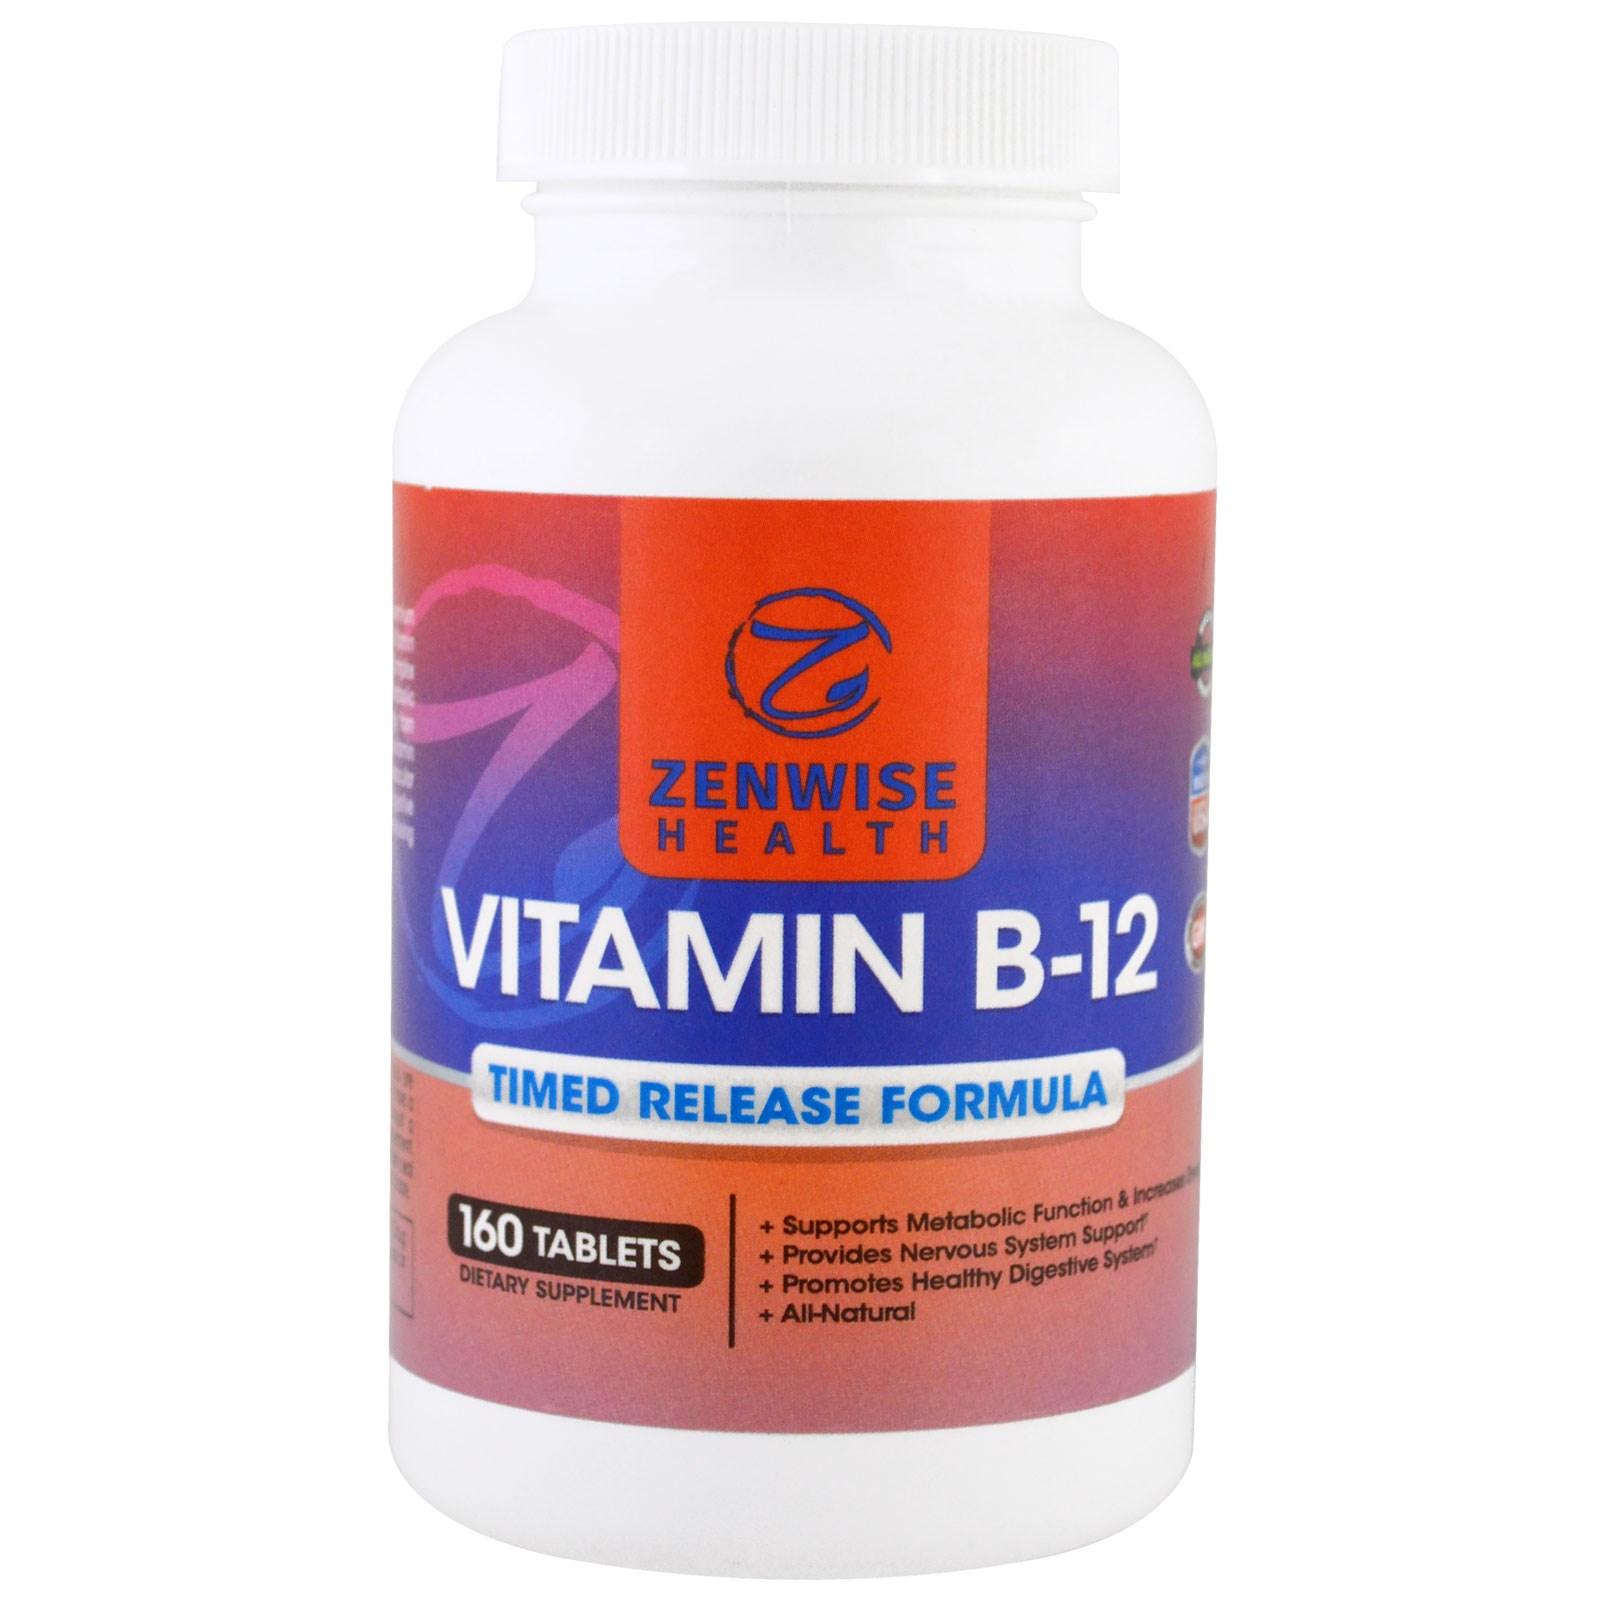 Zenwise Health, Vitamin B12, Timed Release Formula, 160 Tablets